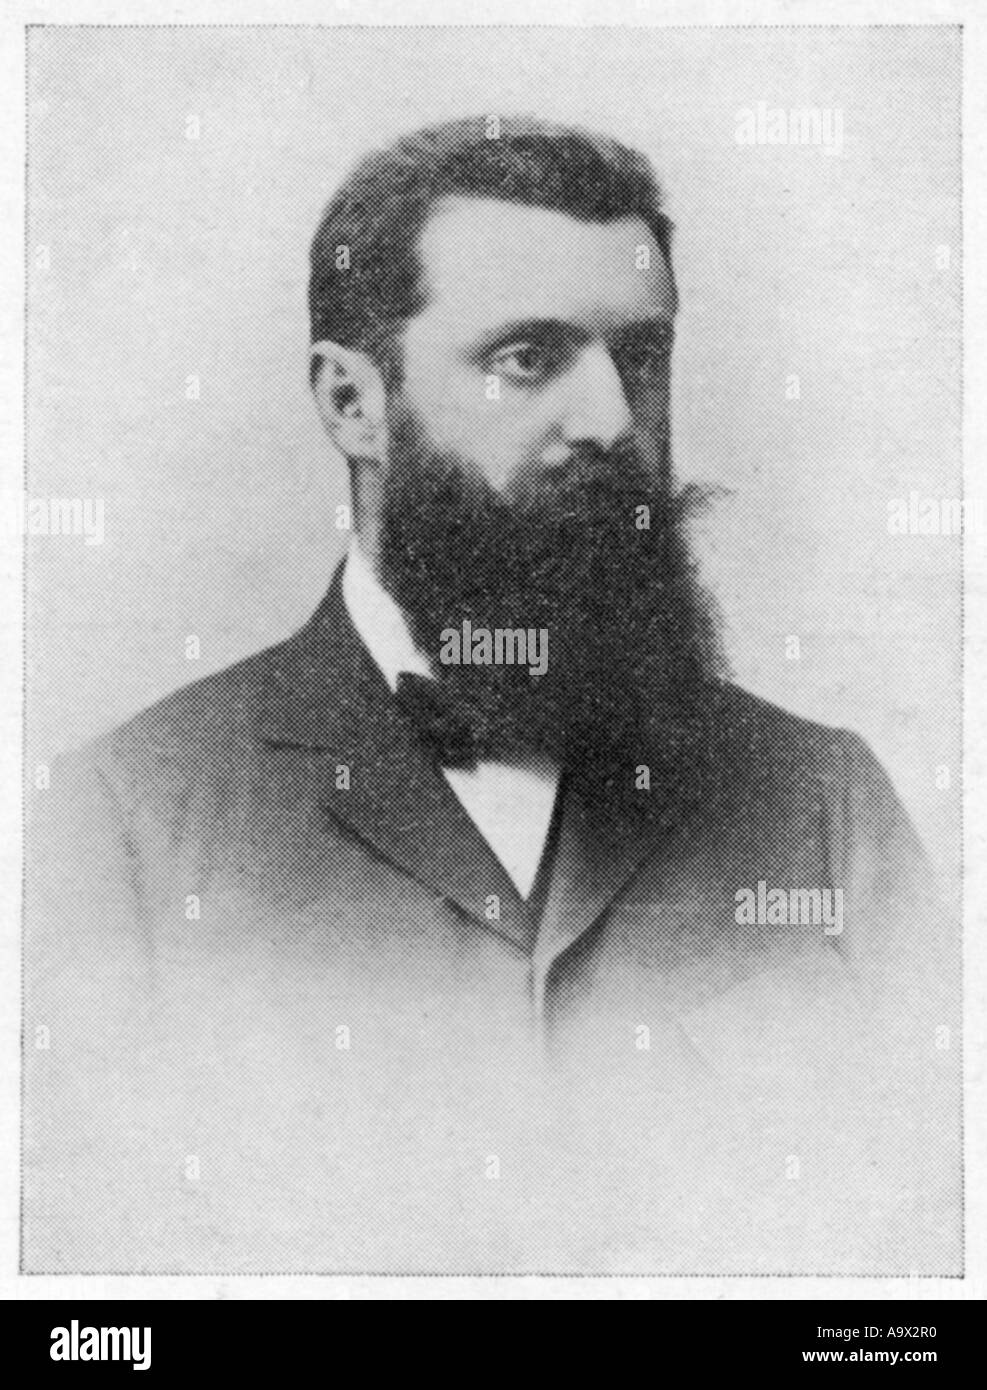 Theodor Herzl Postcard - Stock Image